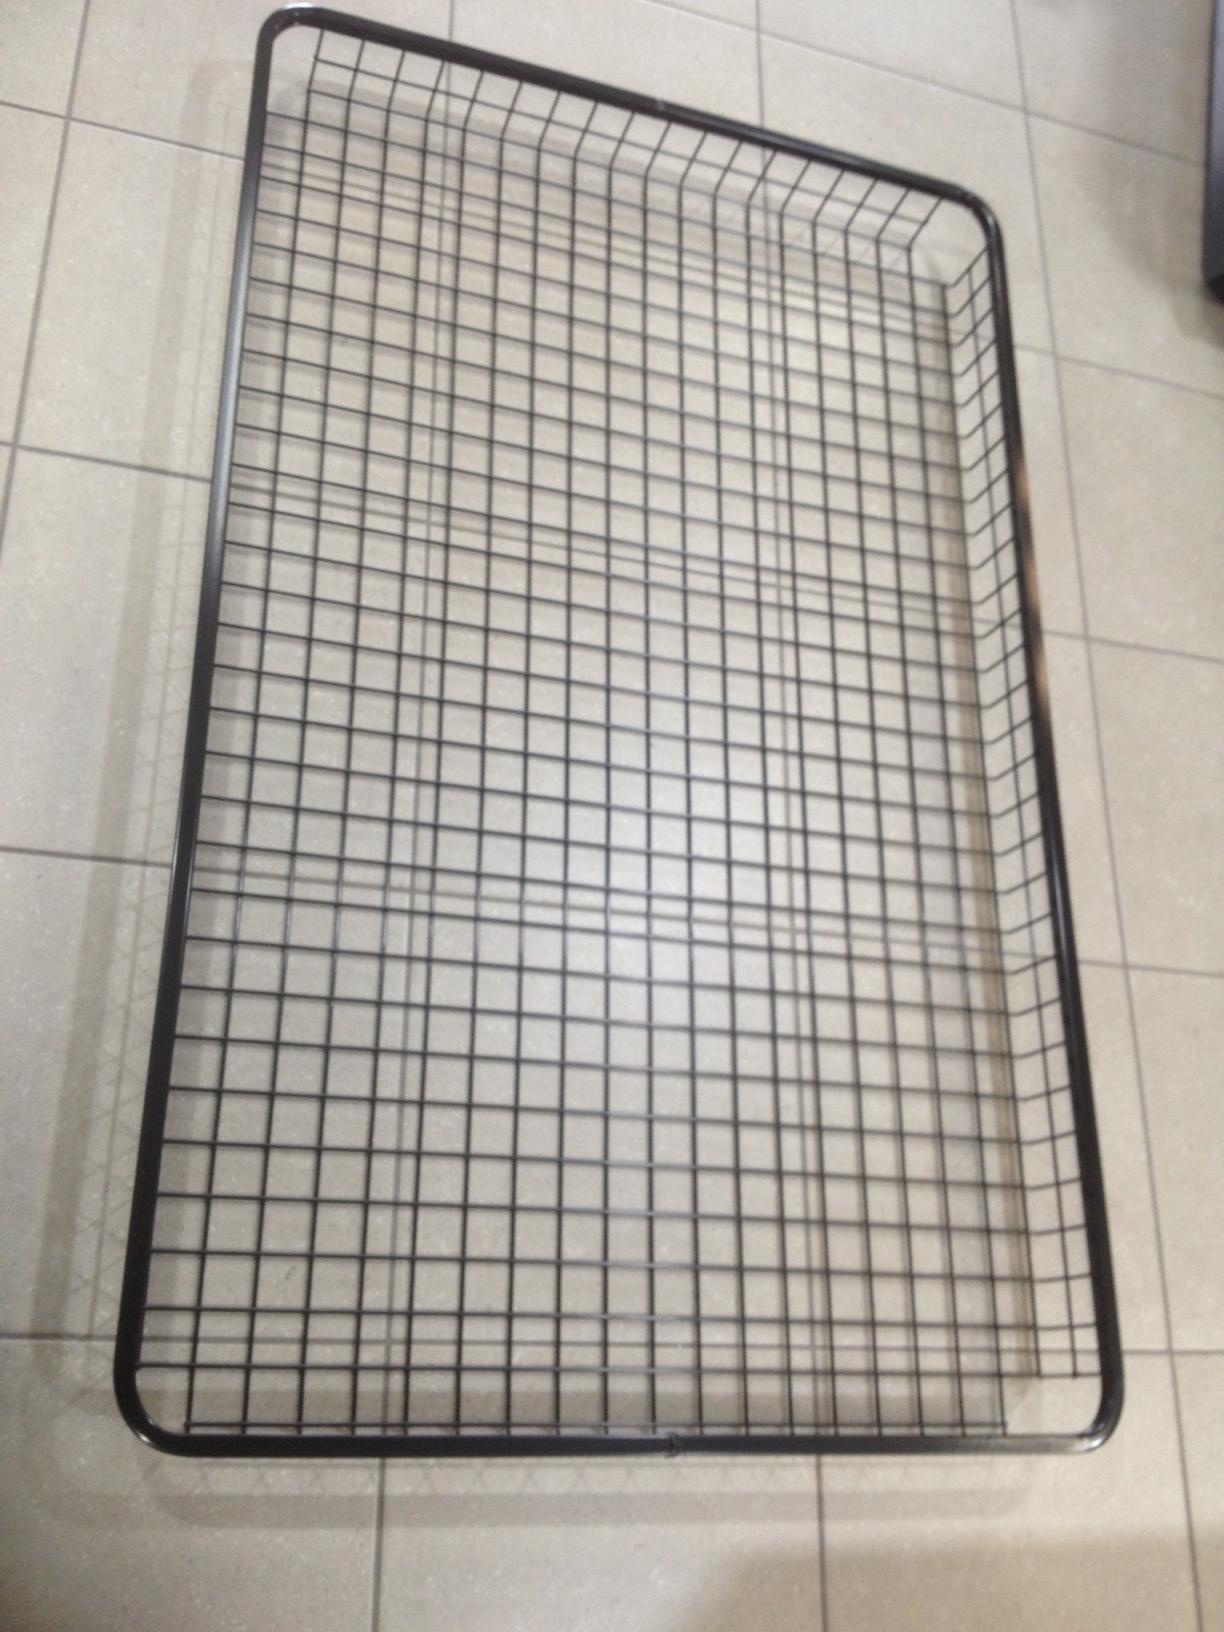 Steel Mesh Luggage Tray Basket Narrow 2200 X 450 X 120mm